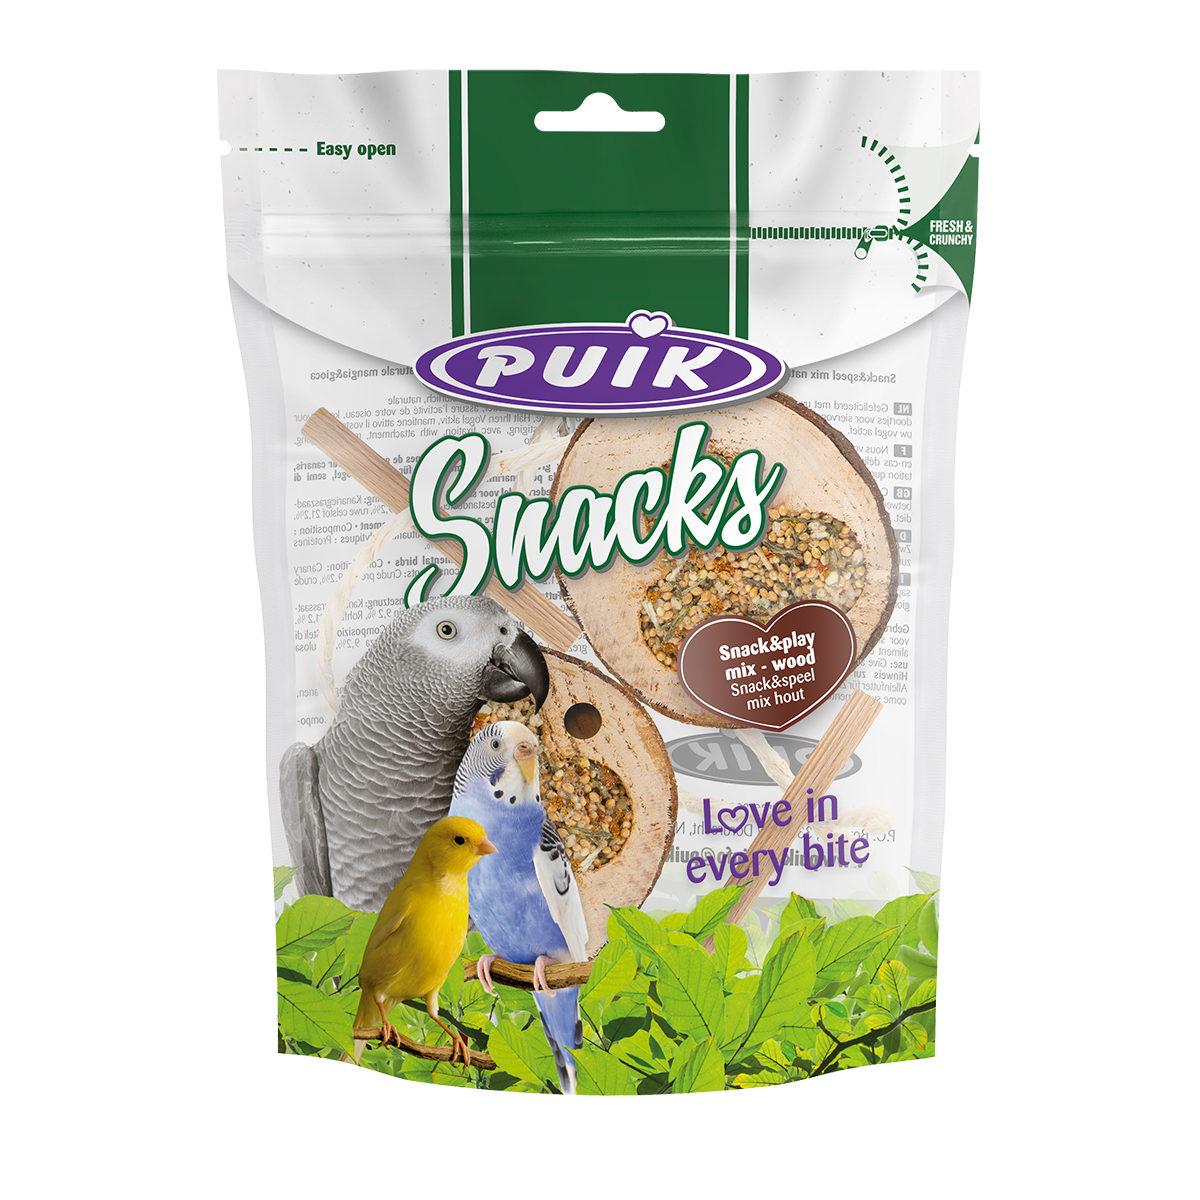 Puik Vogelsnack Snack&Speel Mix Hout 2st